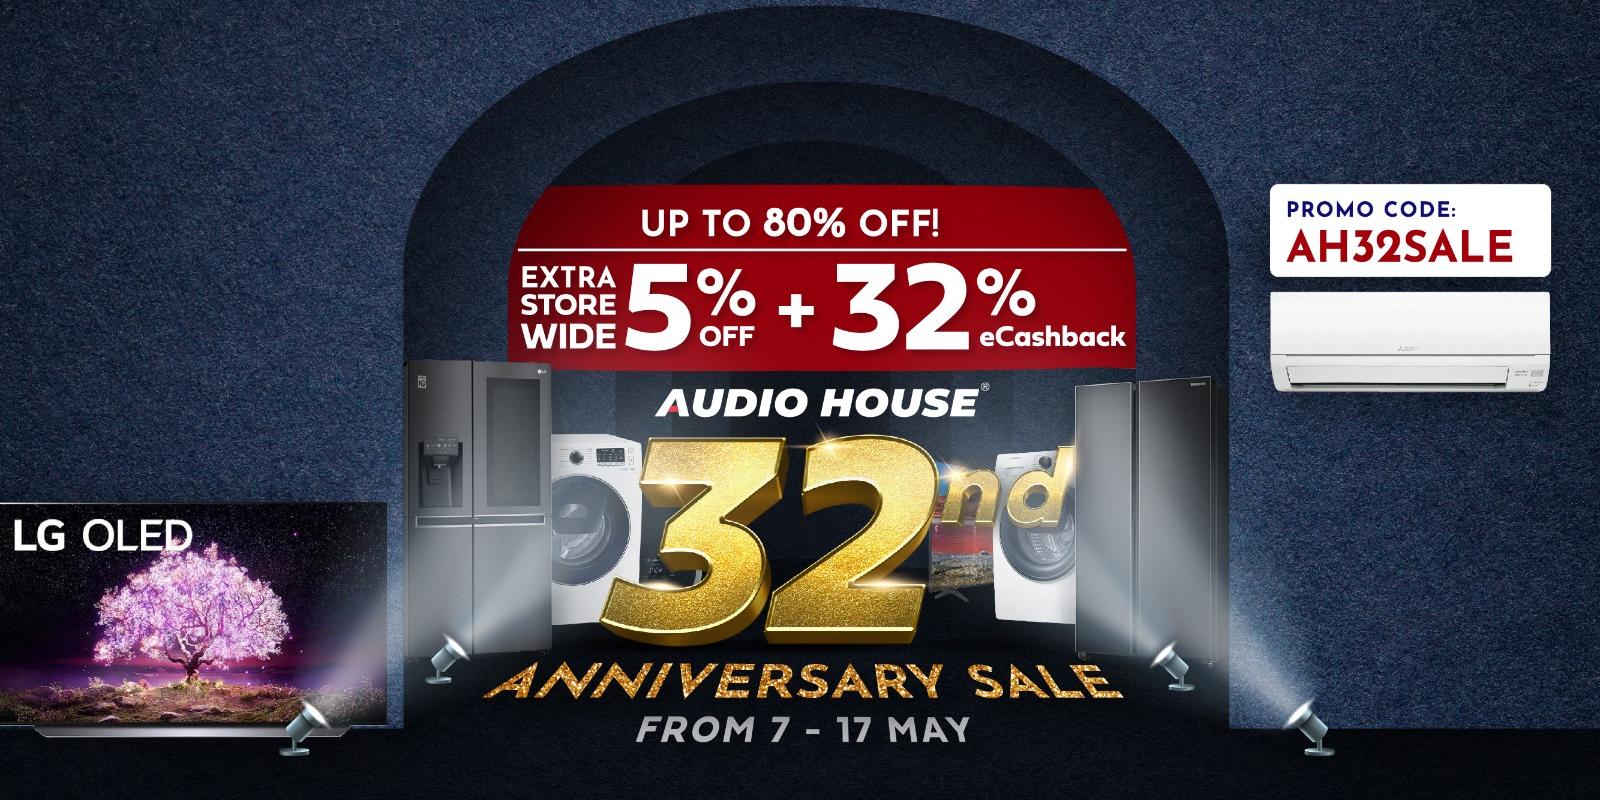 Audio House 32nd Anniversary Sale